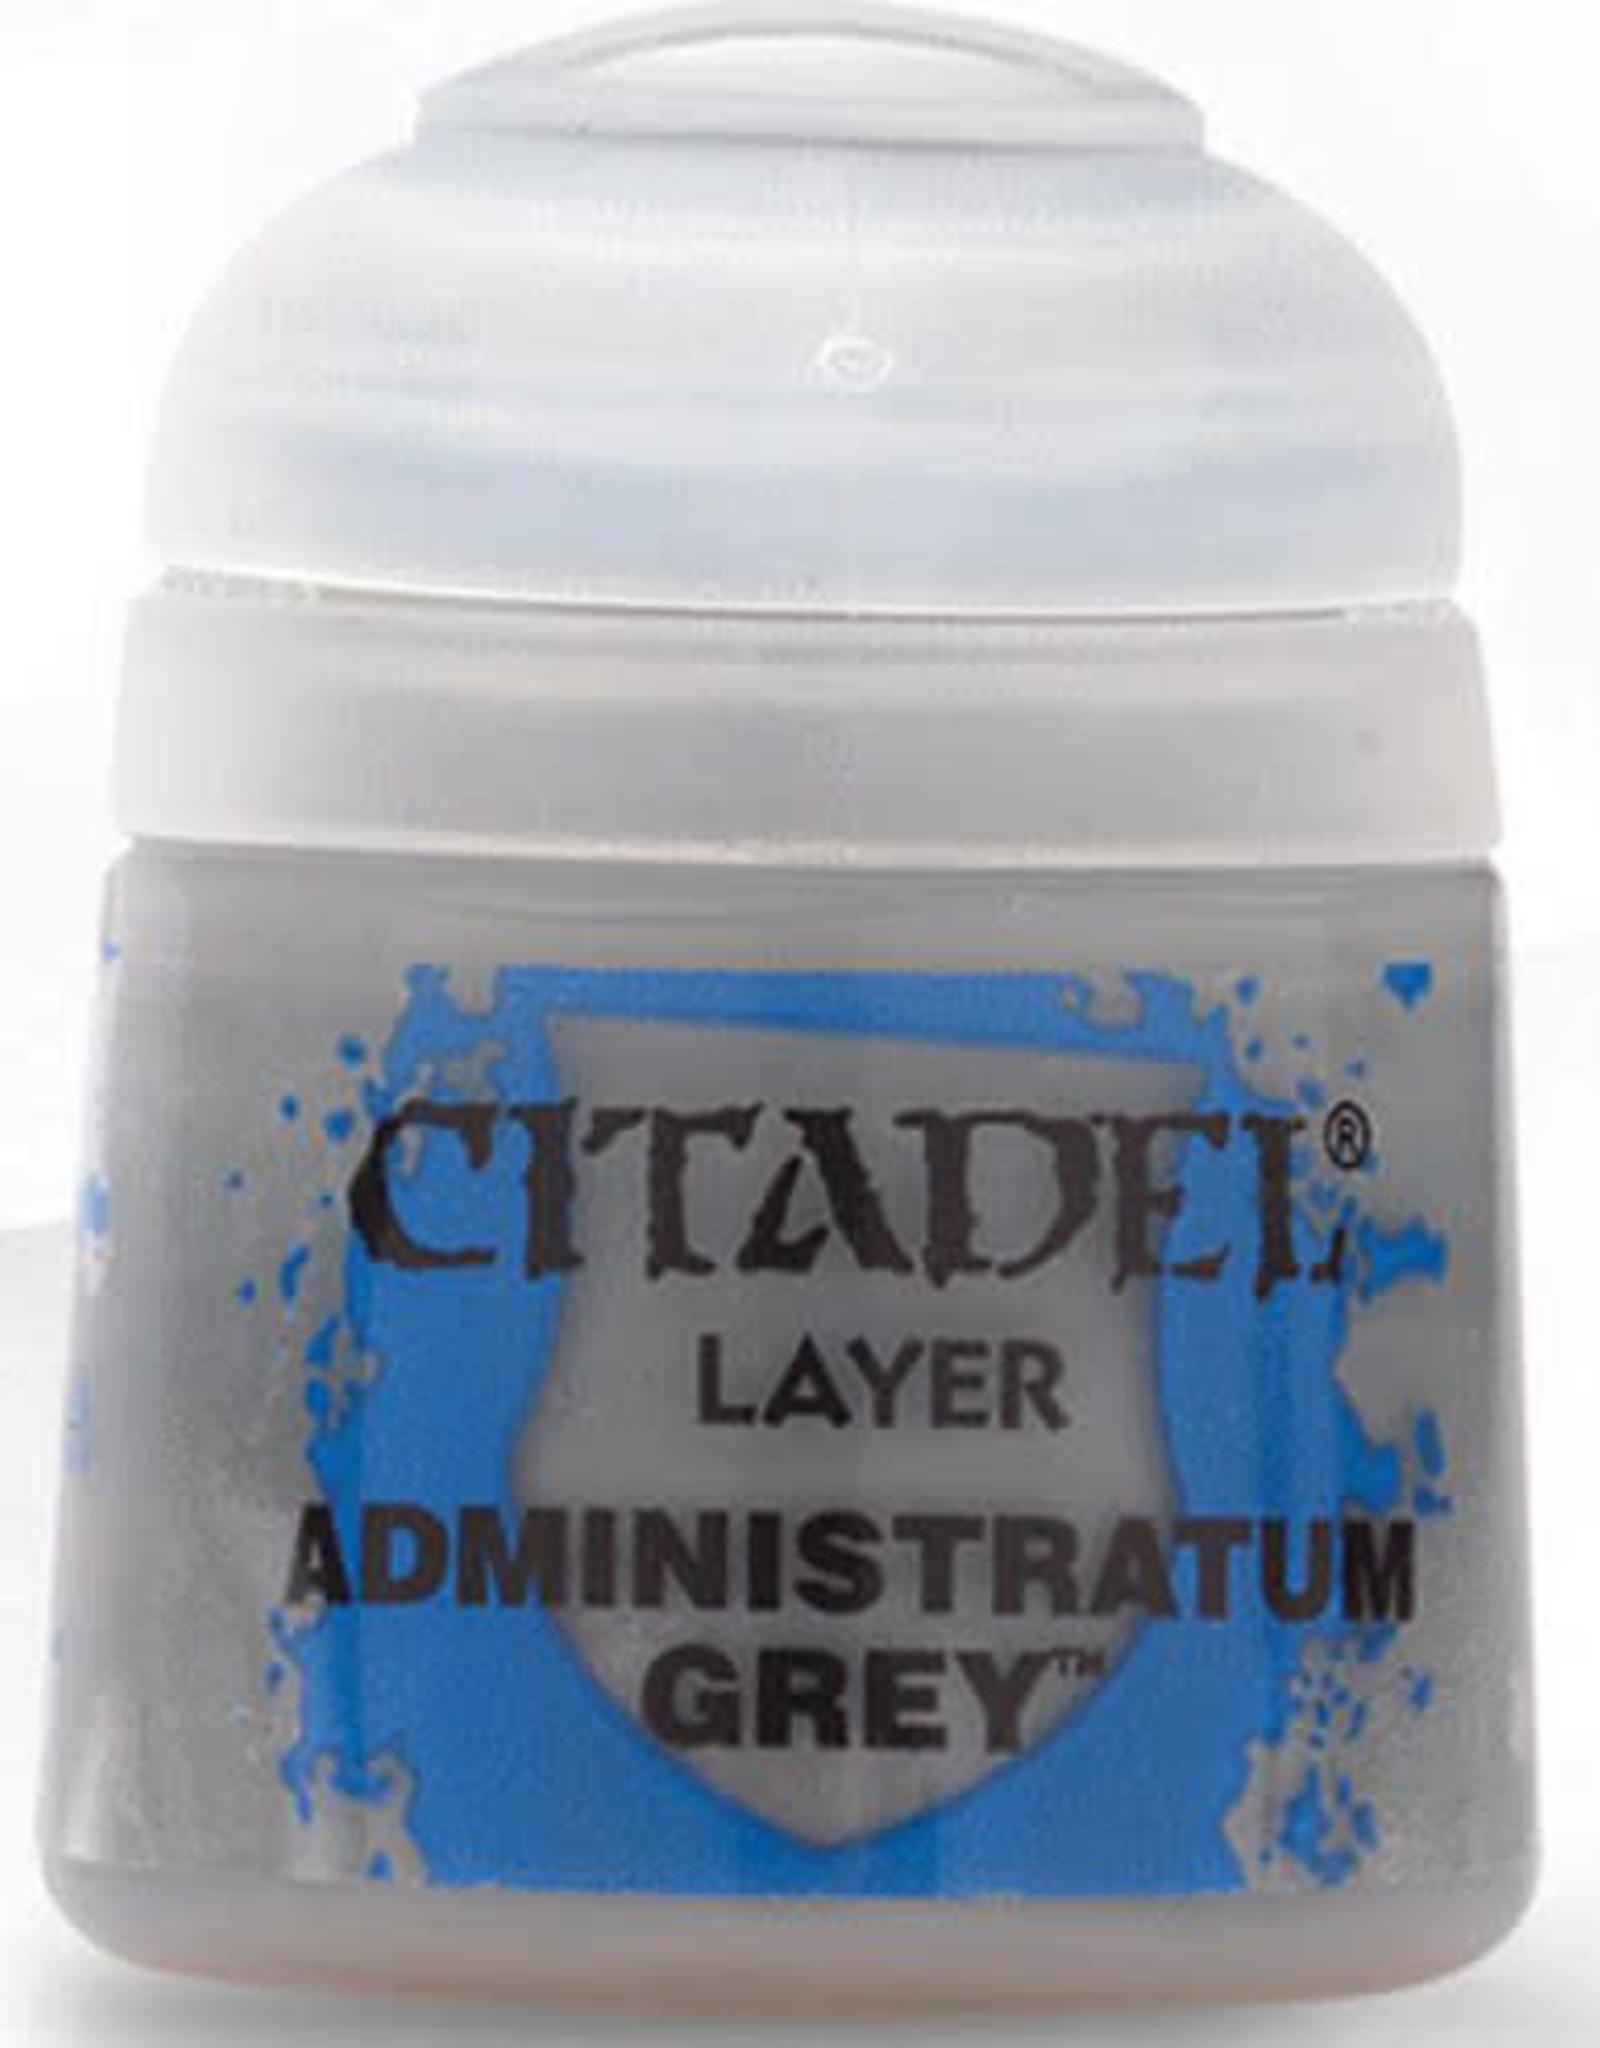 Citadel Layer Paint: Administratum Grey (12ml)